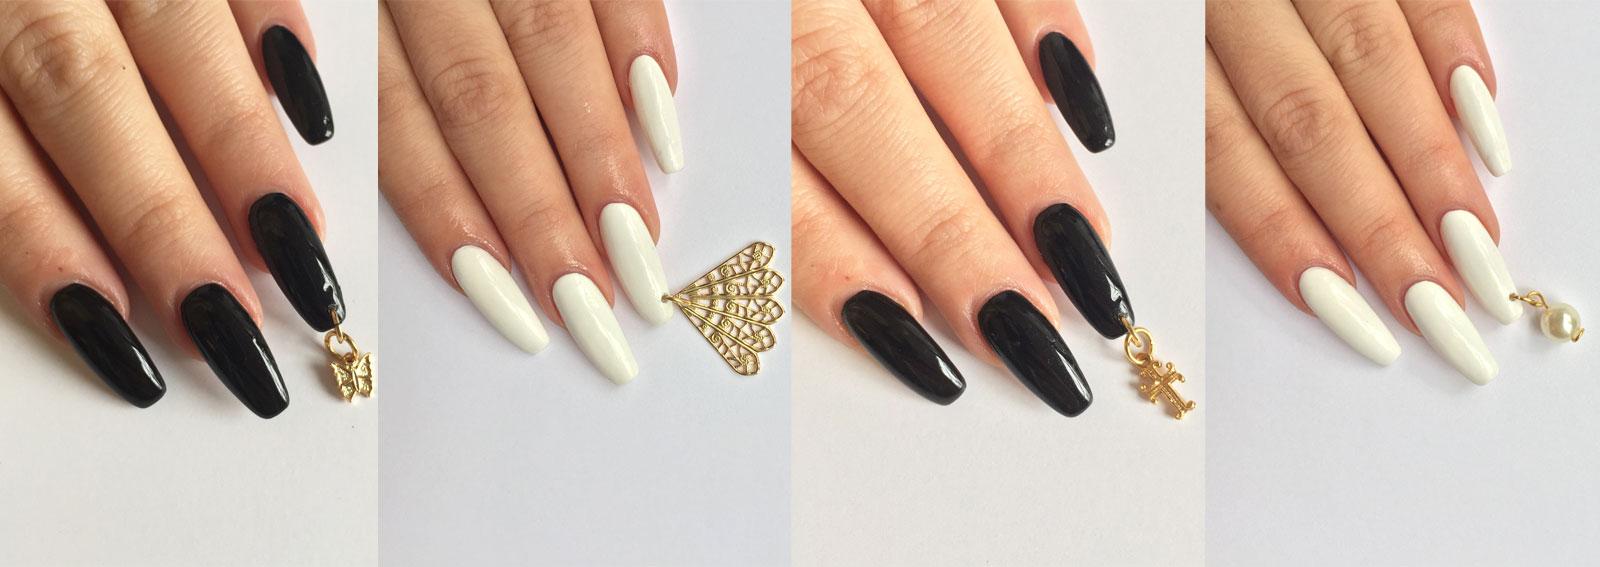 nail-piercing-charm-per-unghie-manicure-nail-art-ciondoli-COVER-DESKTOP